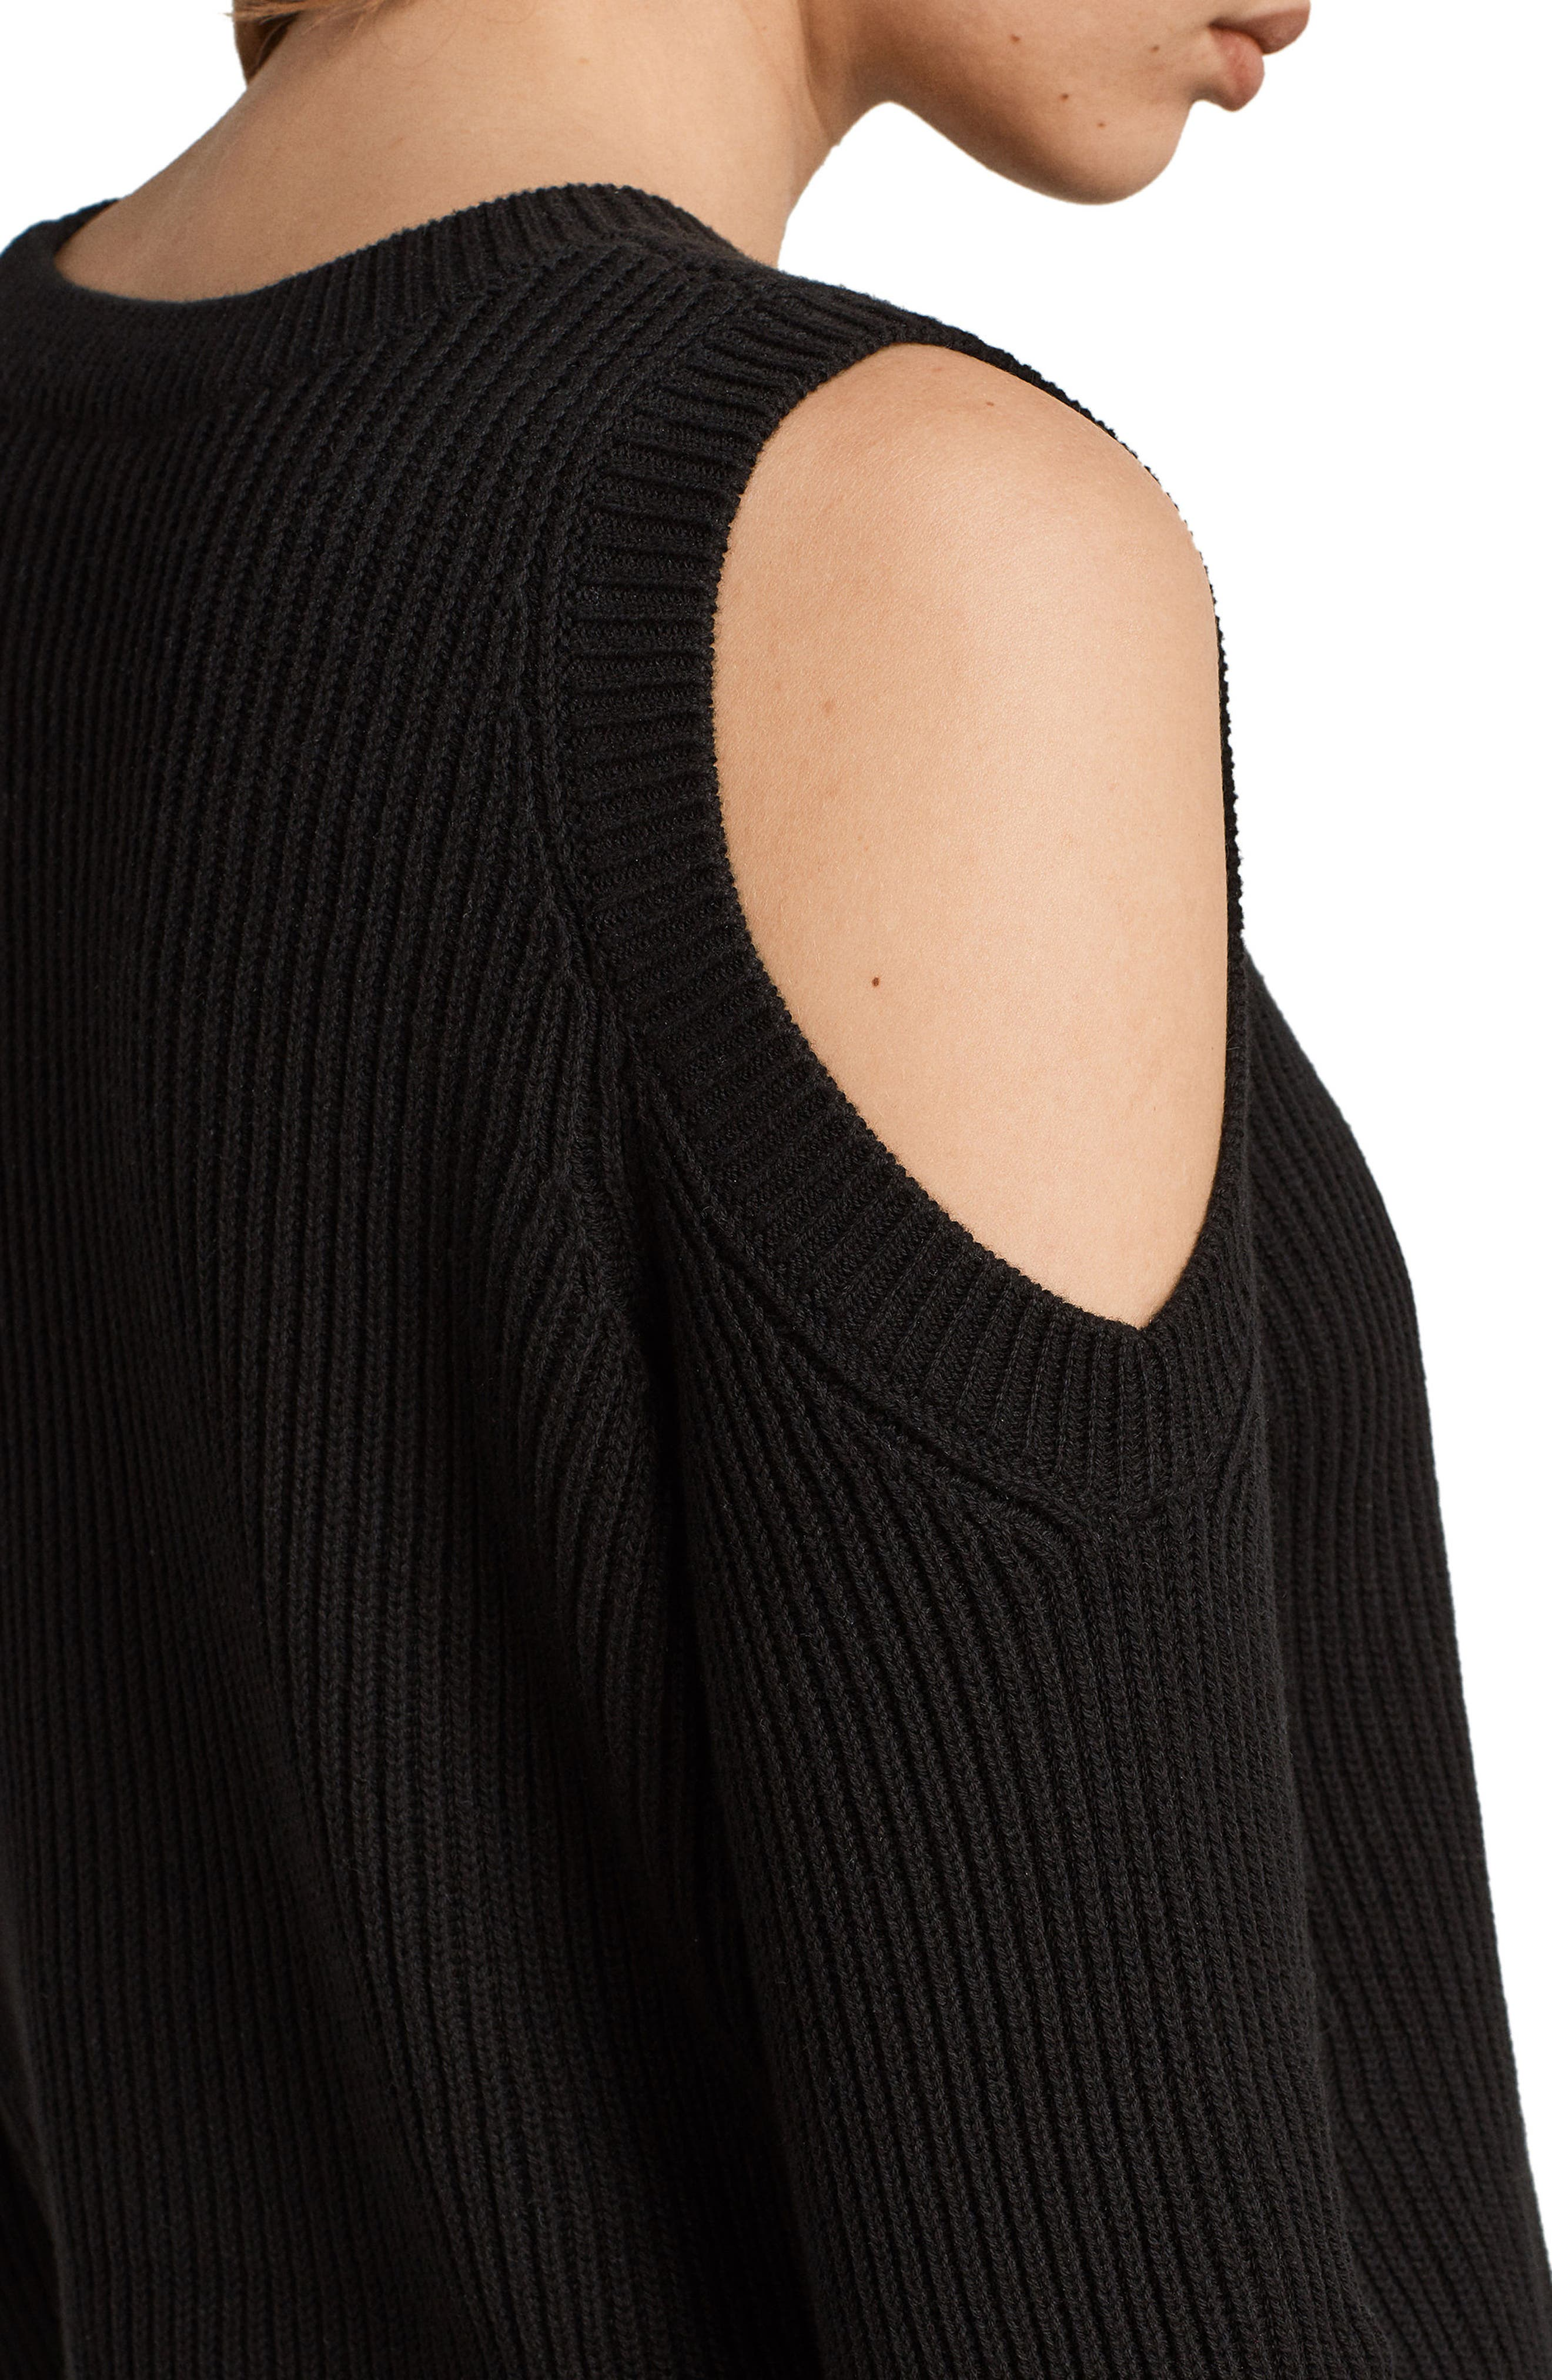 Pepper Cold Shoulder Sweater,                             Alternate thumbnail 4, color,                             001